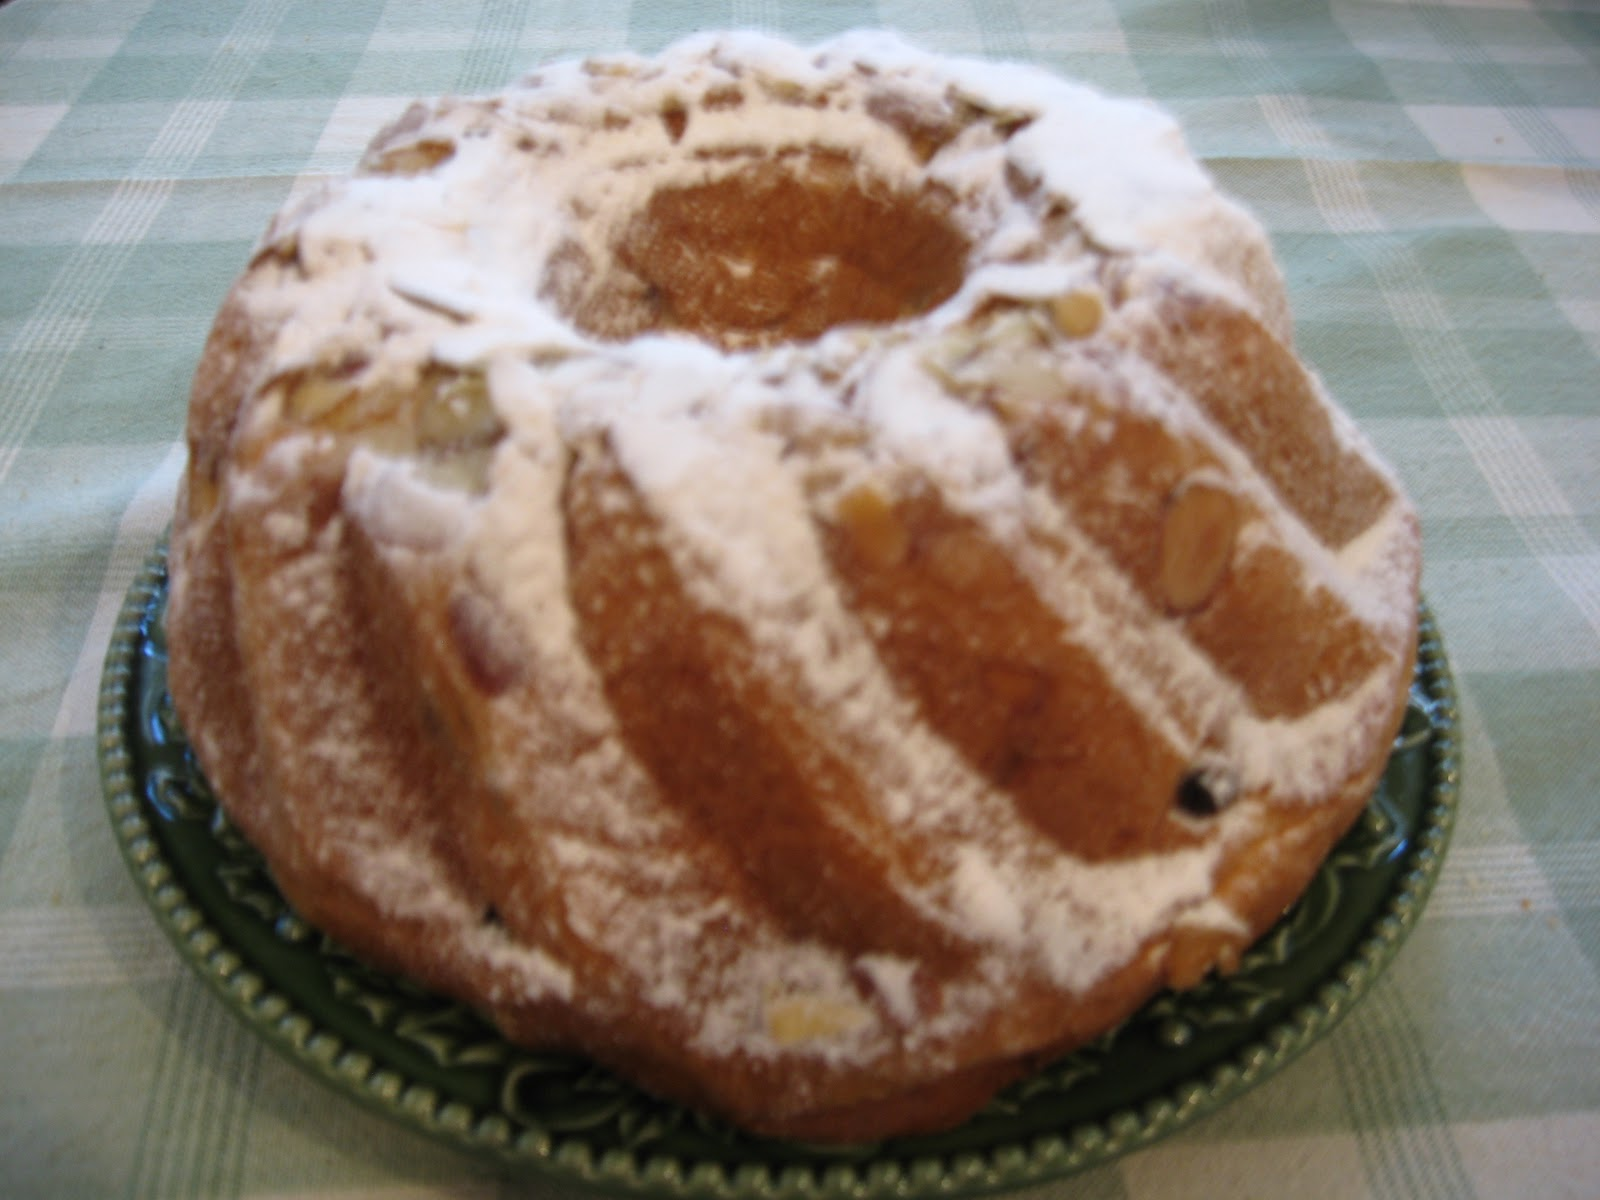 Tangerine Travels: Gugelhupf: German Sweet Holiday Bread